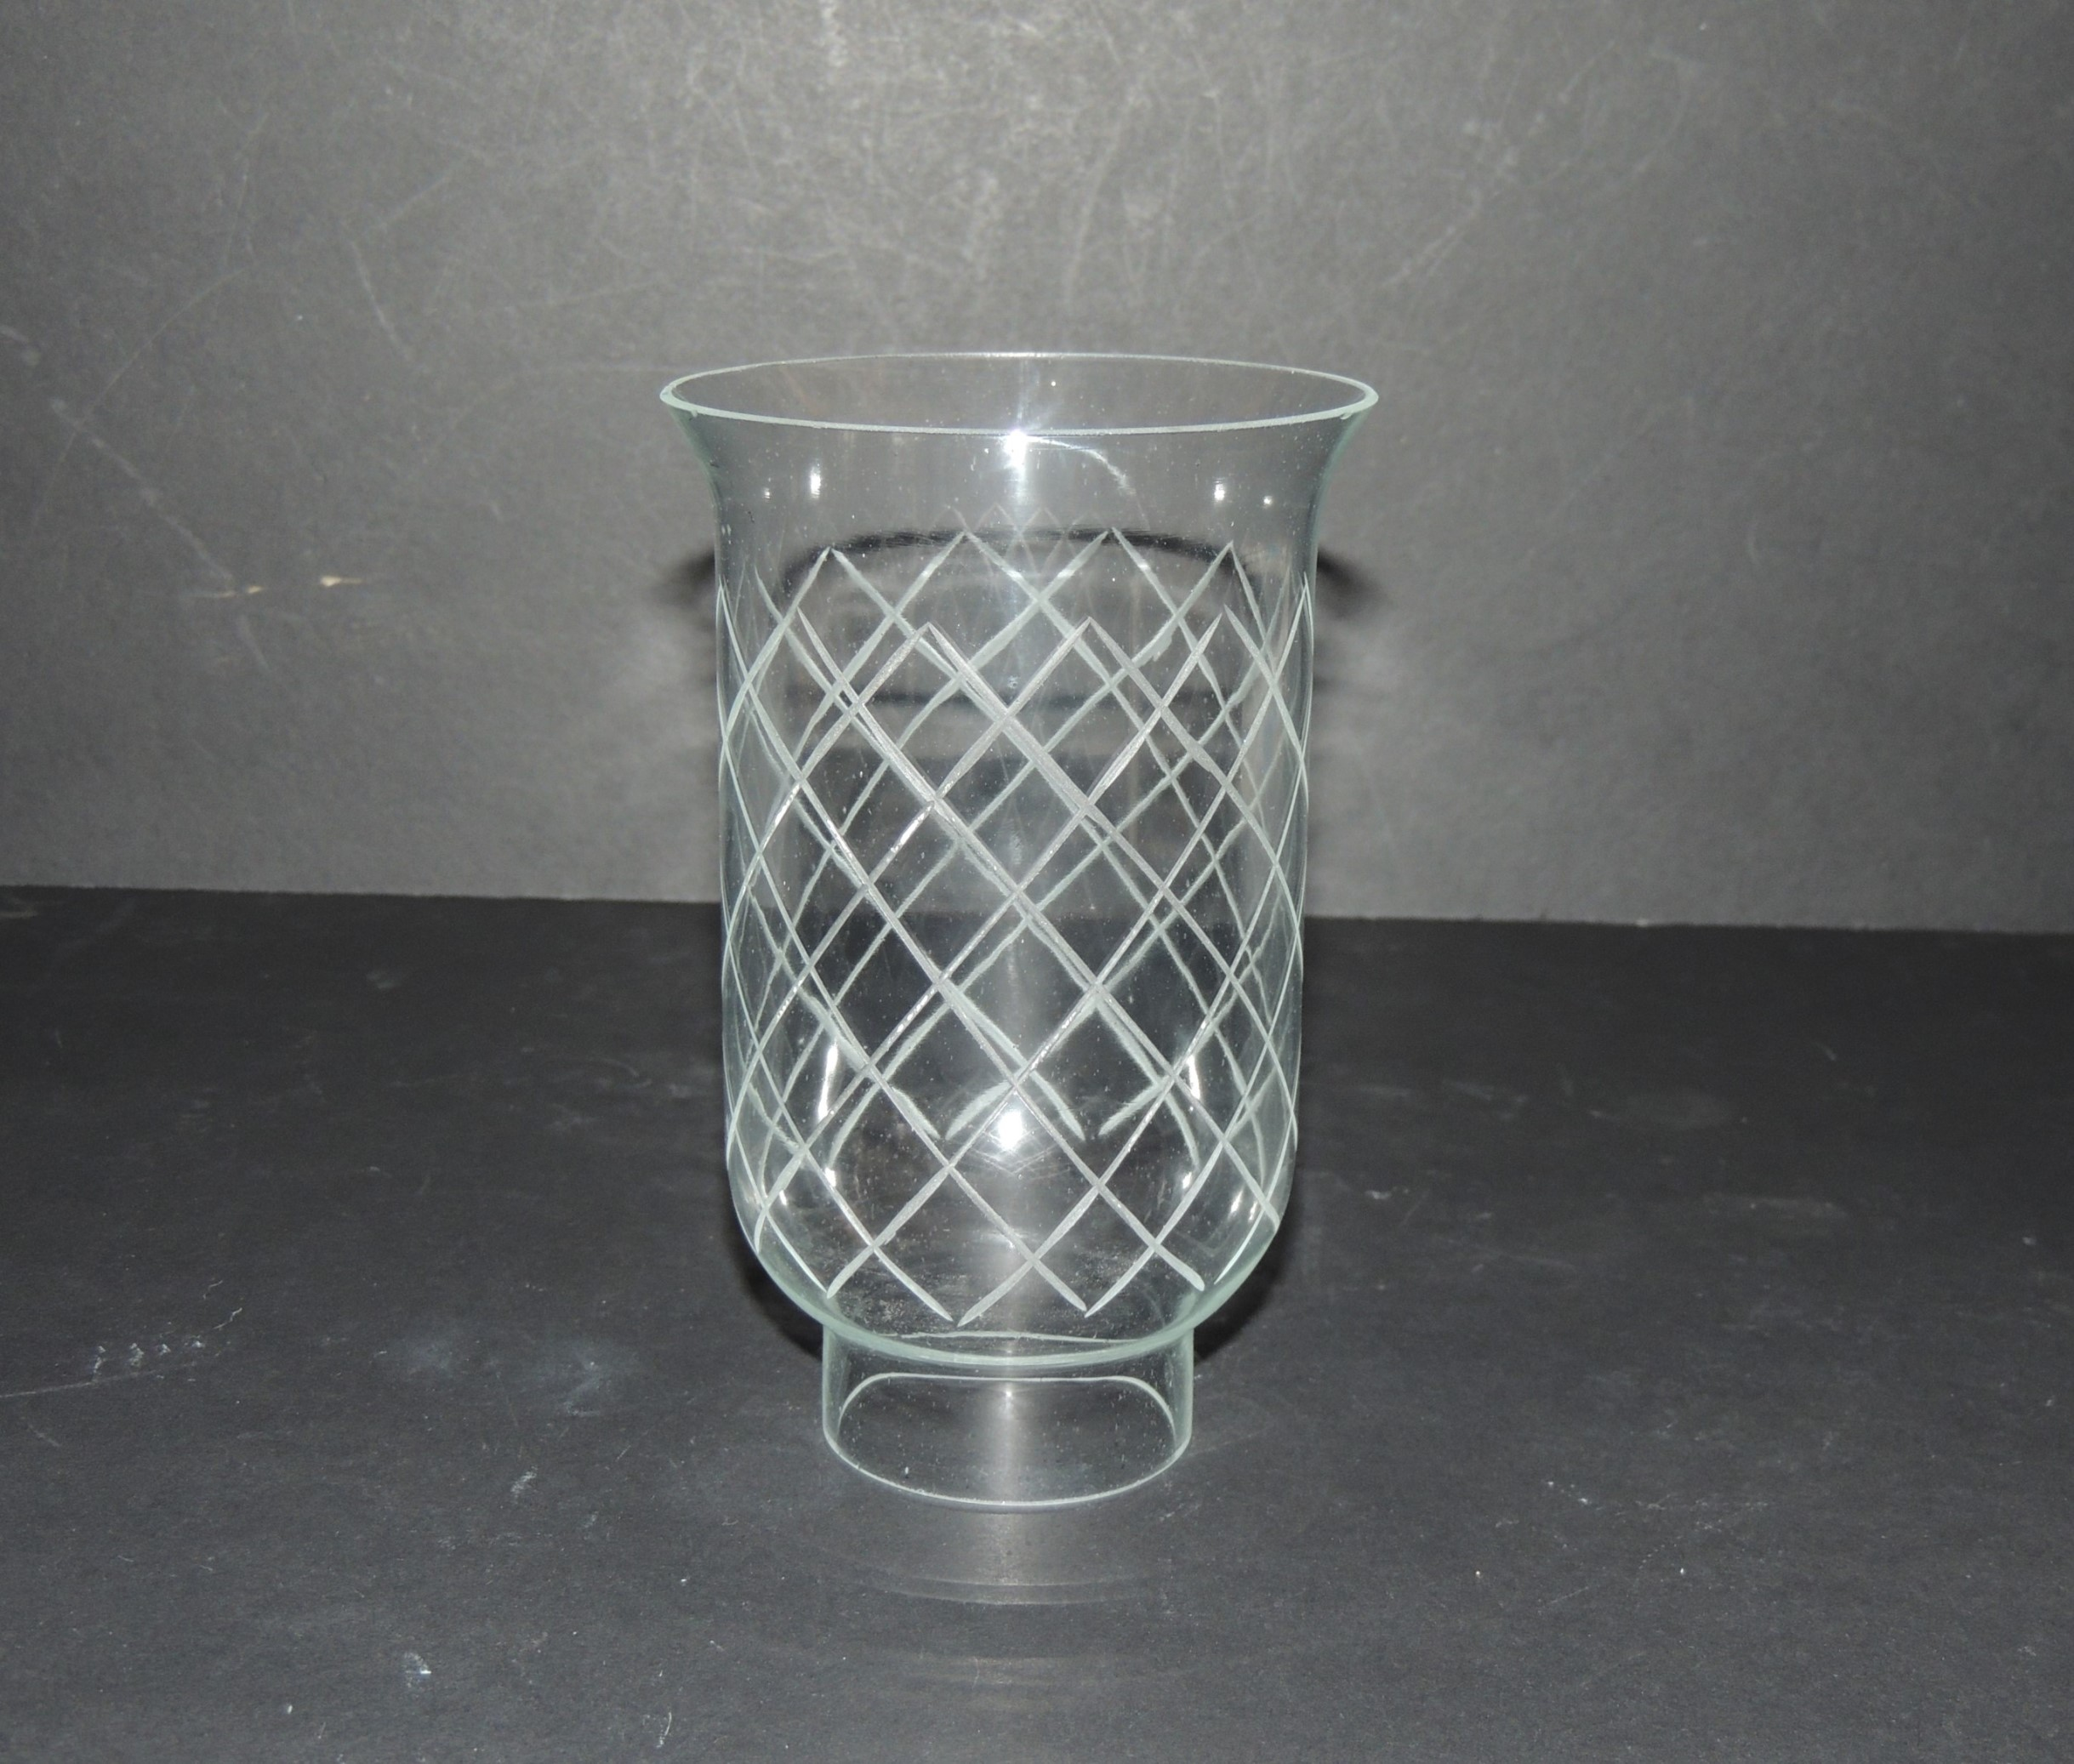 candele per lampadari : Vetri di ricambio per lampadari: Vetro per porta candele piccolo ...